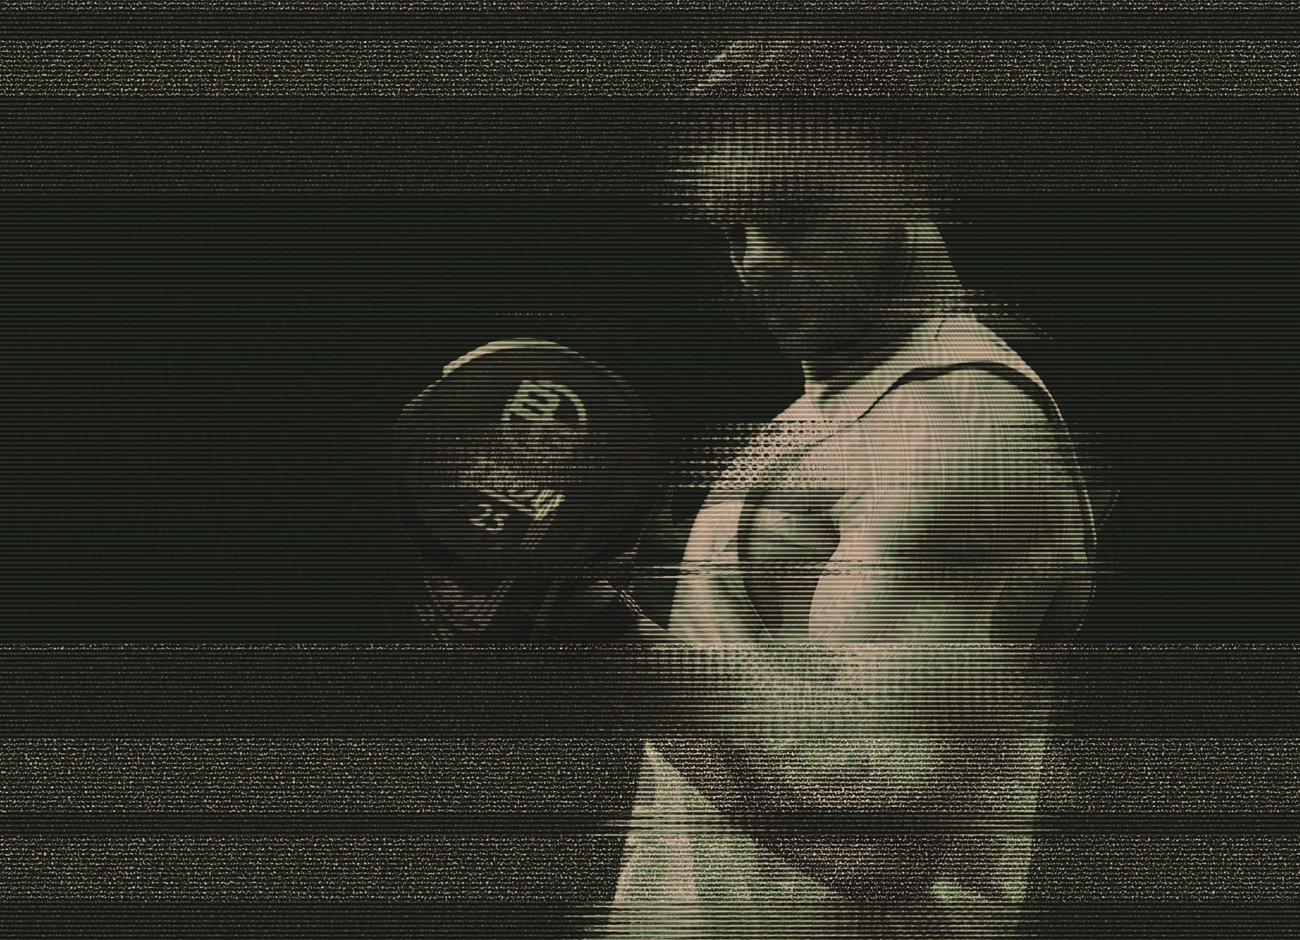 潮流故障风人像照片处理特效PS动作模板 Glitch Portrait Effect PS Action插图4